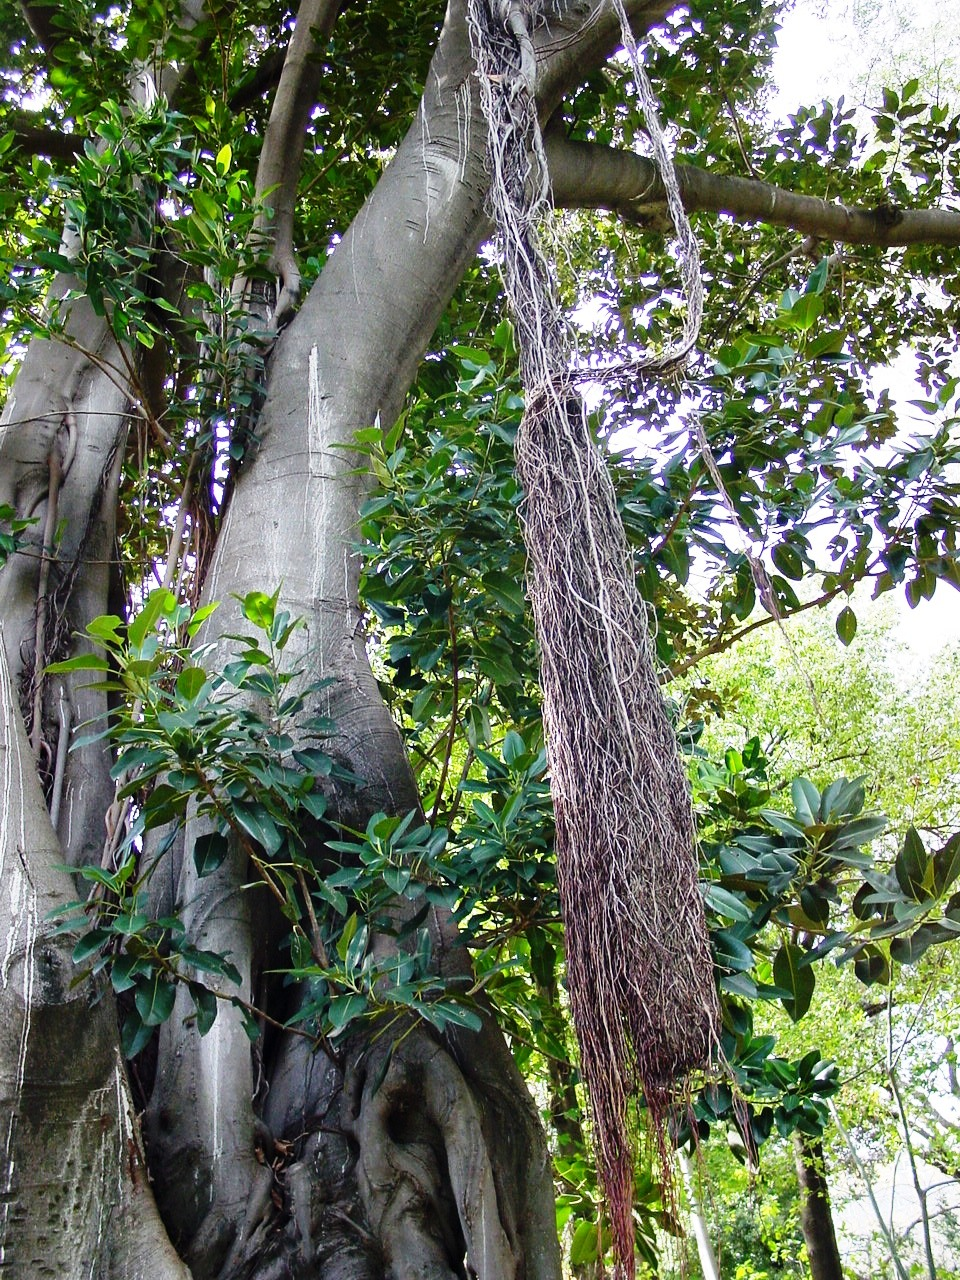 plante grimpante feuillage persistant abri jardin bois. Black Bedroom Furniture Sets. Home Design Ideas